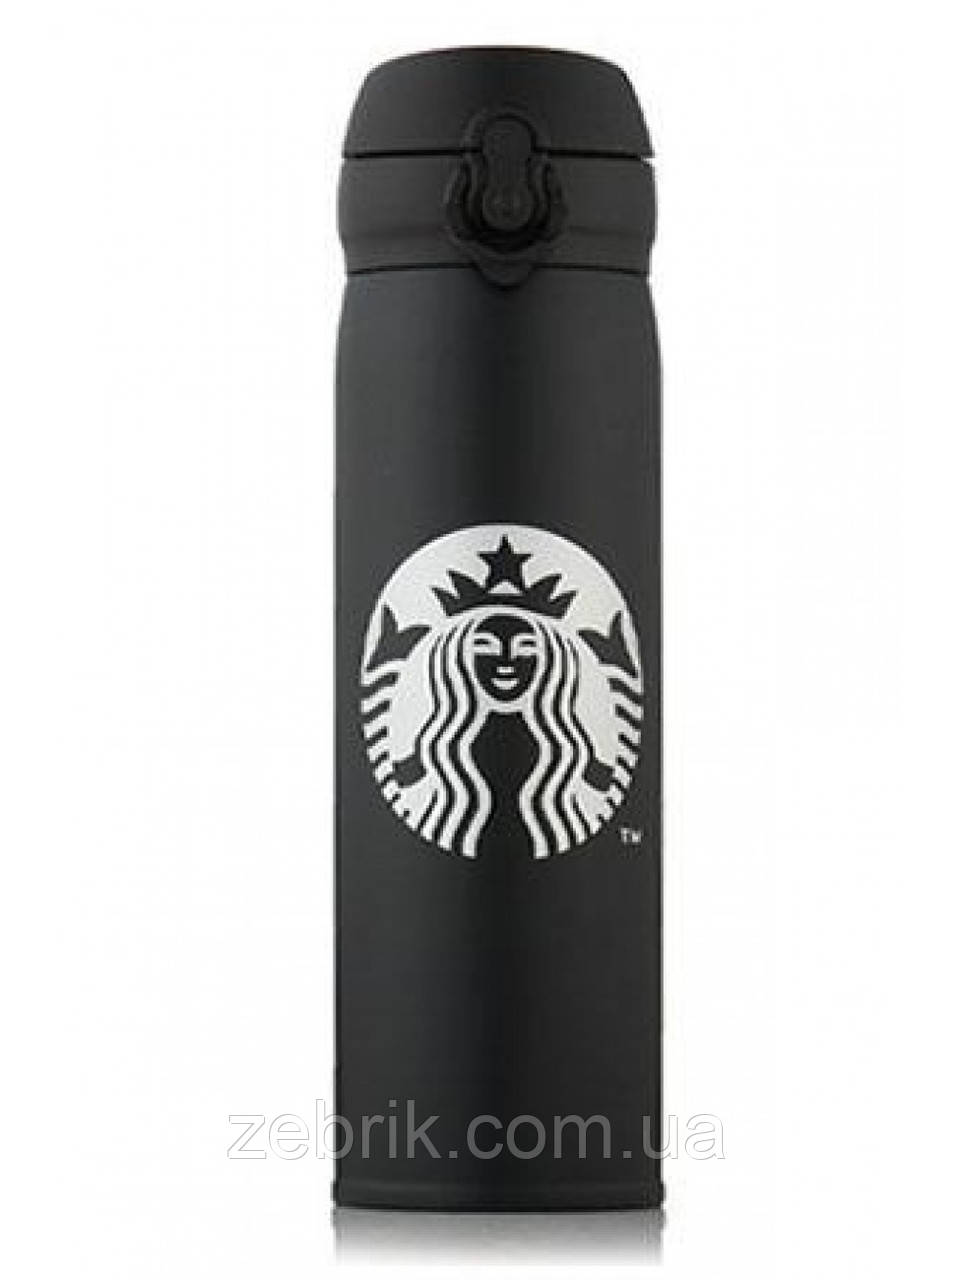 Термос Starbucks Старбакс